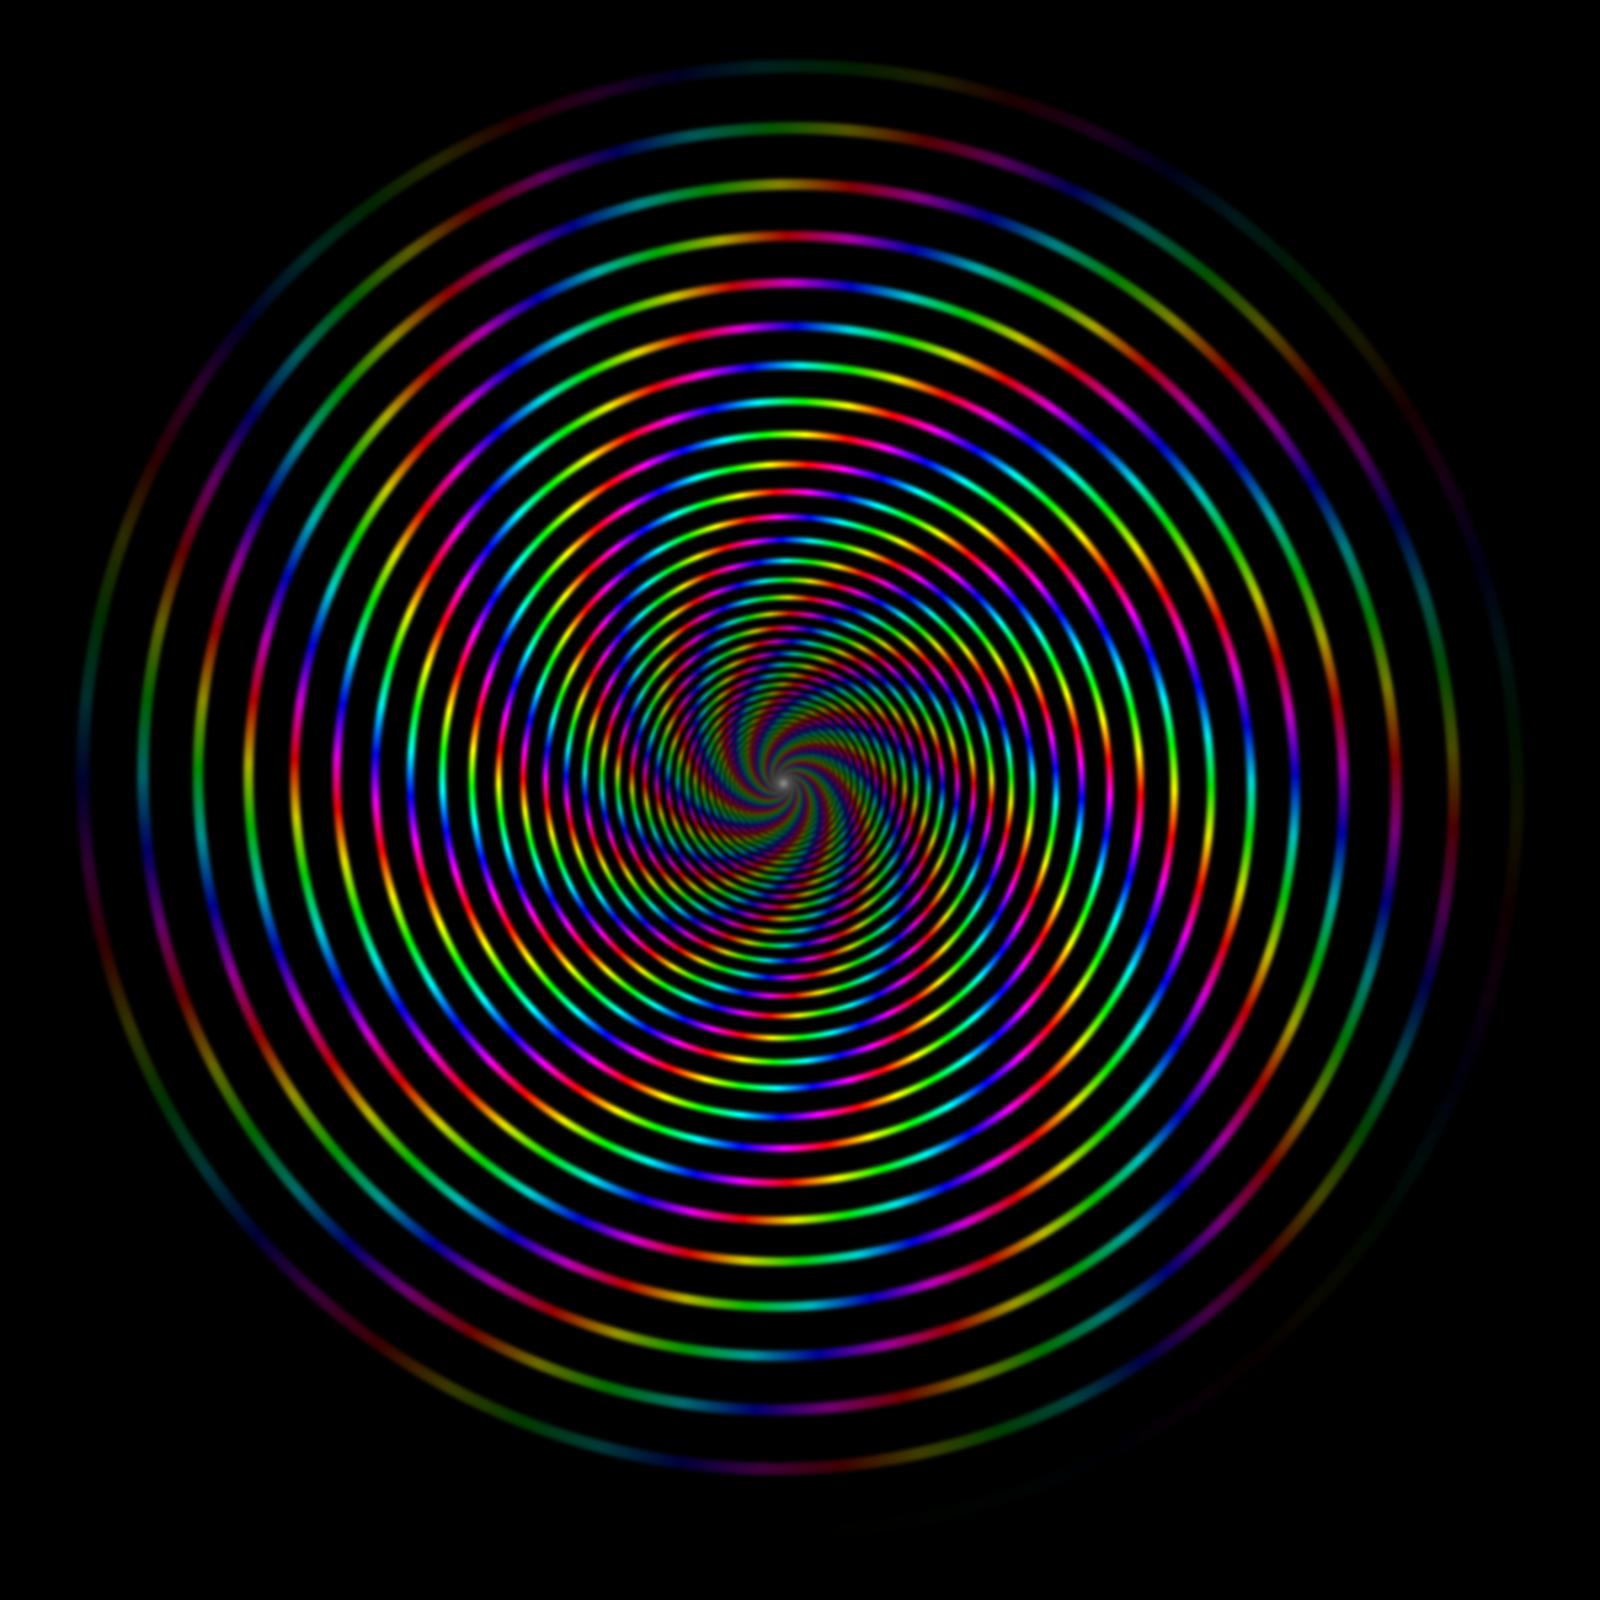 spiral rainbow - photo #3